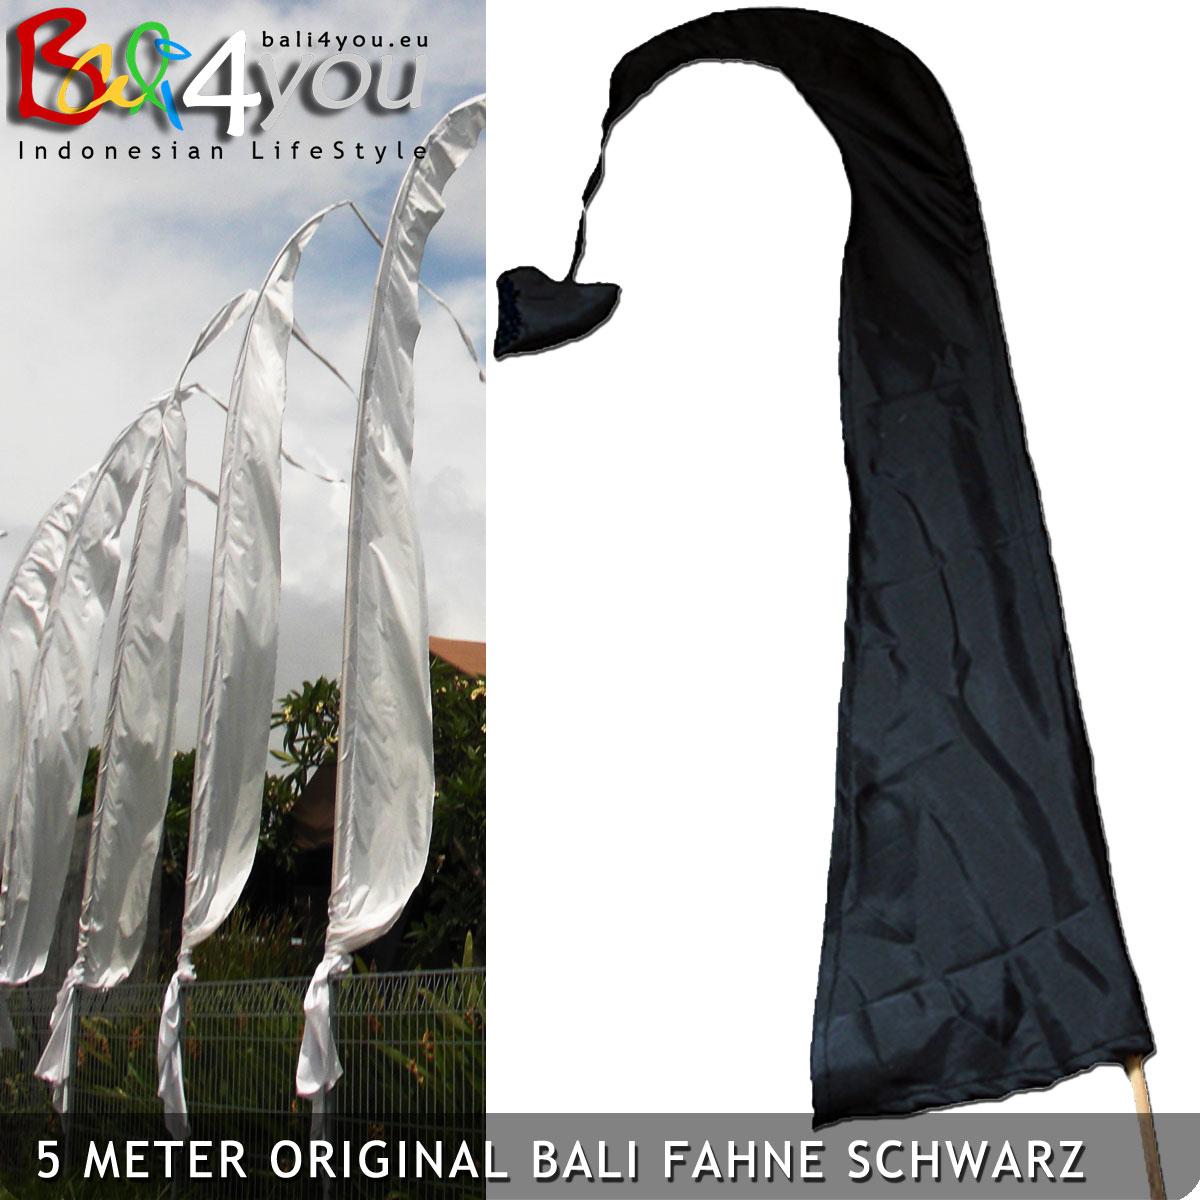 5m Bali Fahne Schwarz